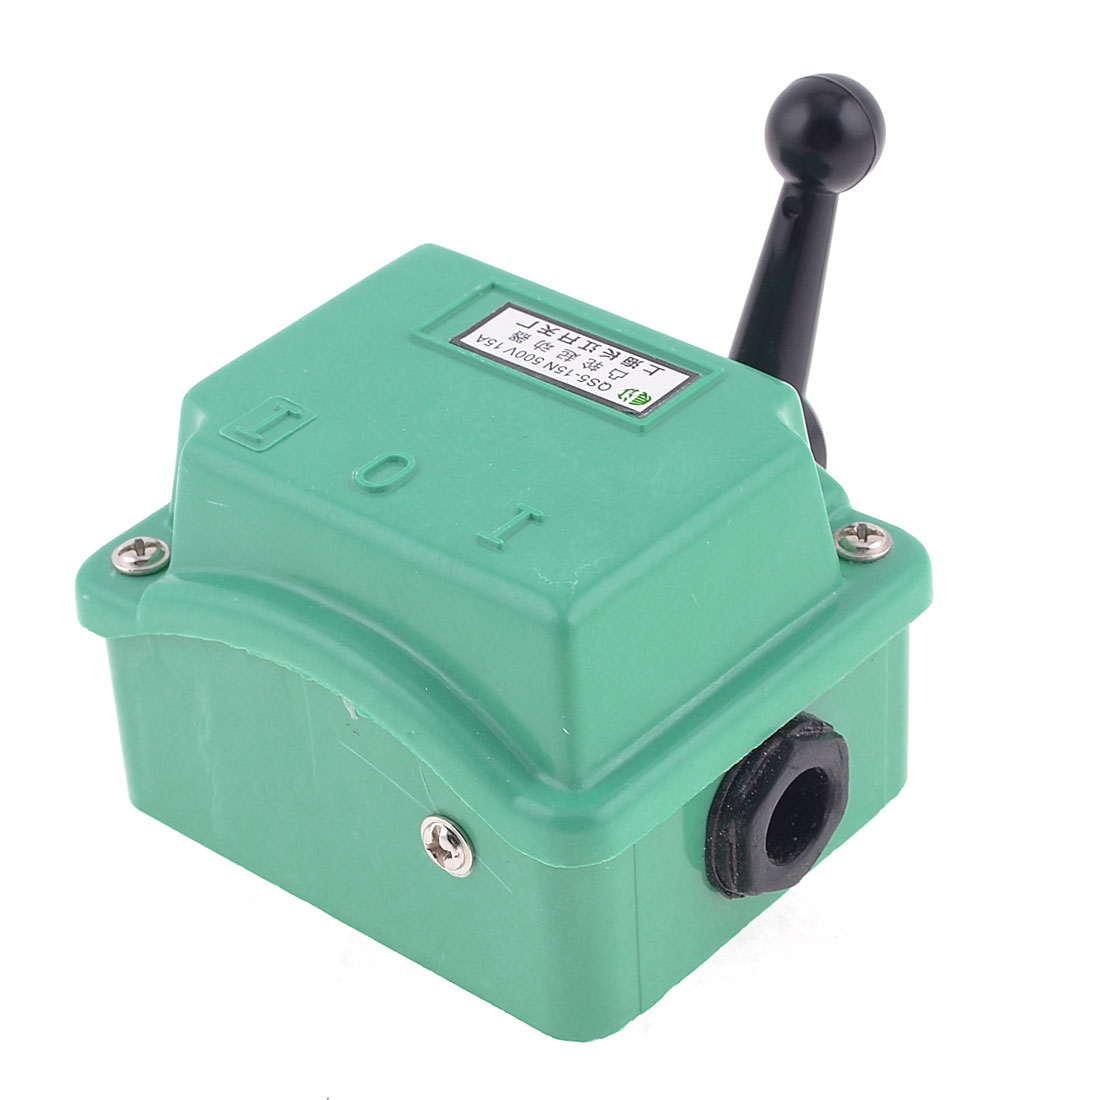 500V 15A 3 Position 3 Pole Motor Starter Protector